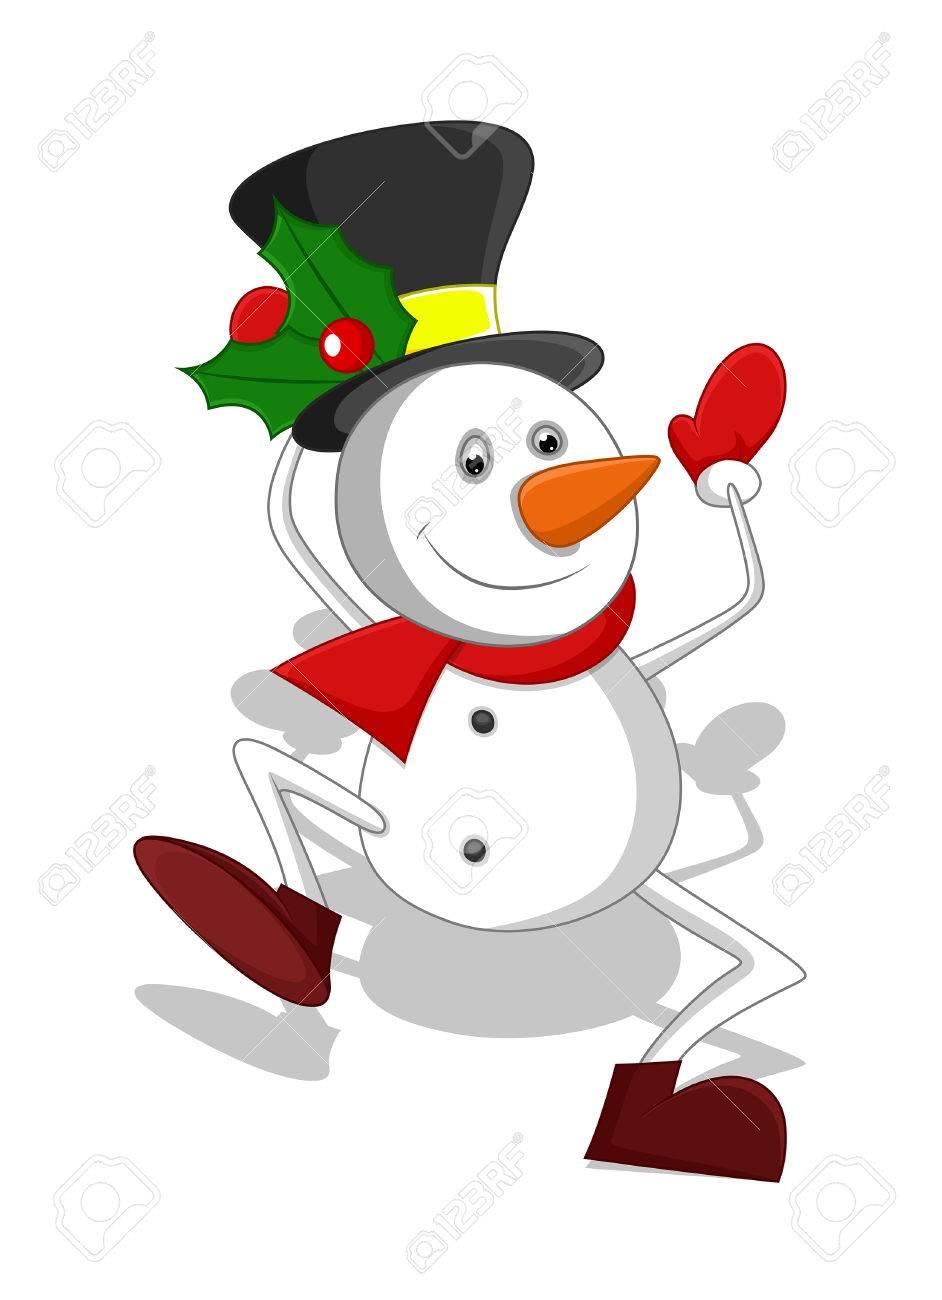 Funny Cartoon Snowman Santa Dancing.